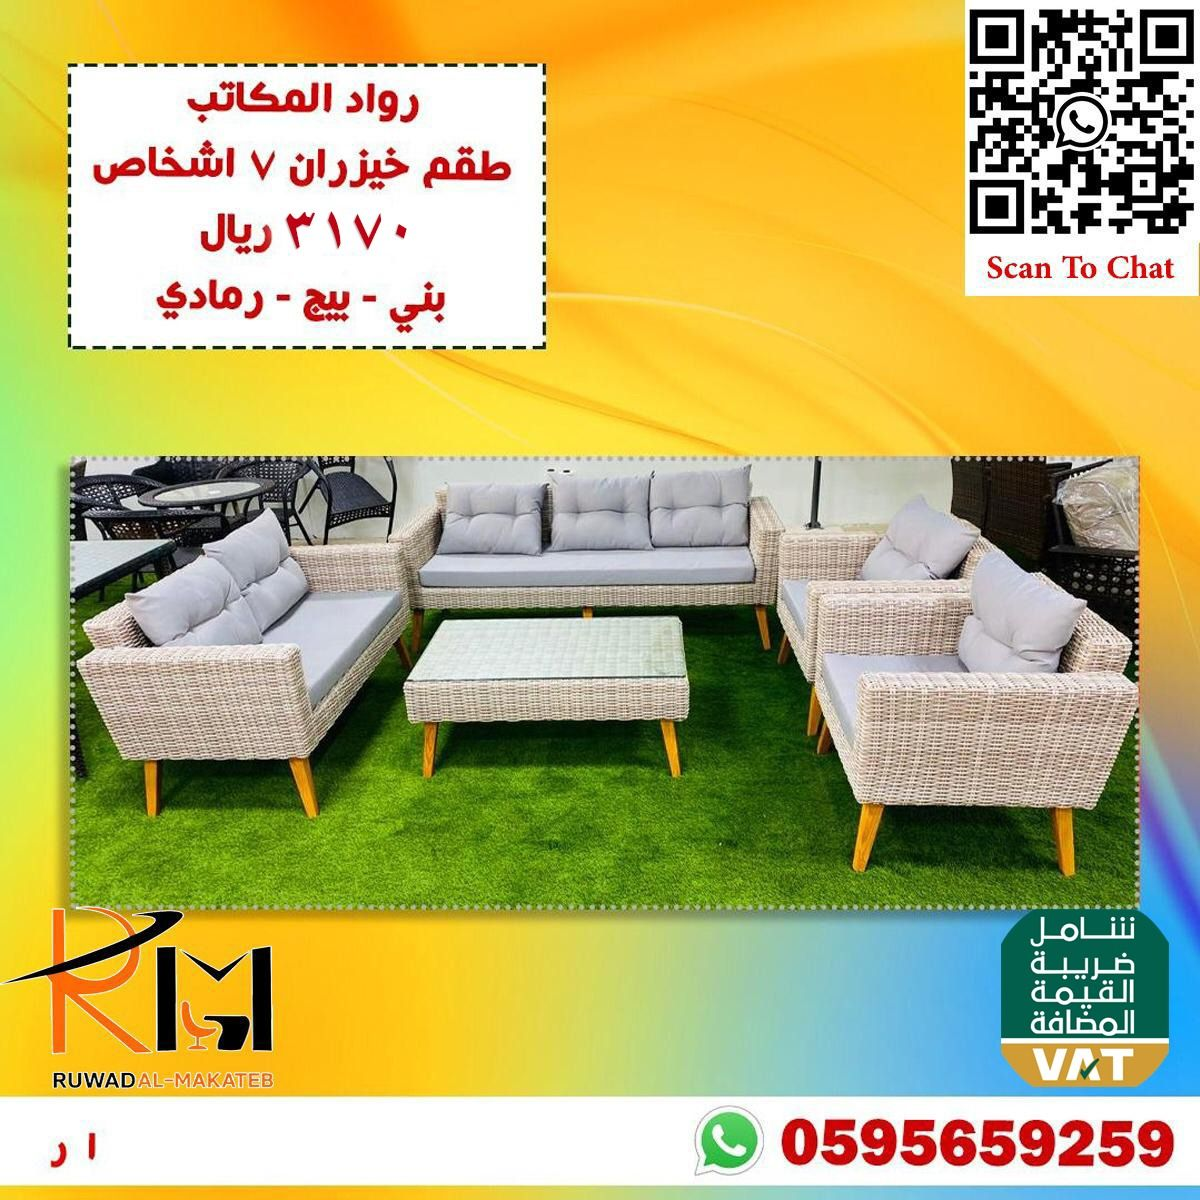 كنب خيزران ٧ اشخاص In 2021 Outdoor Furniture Sets Outdoor Decor Outdoor Sofa